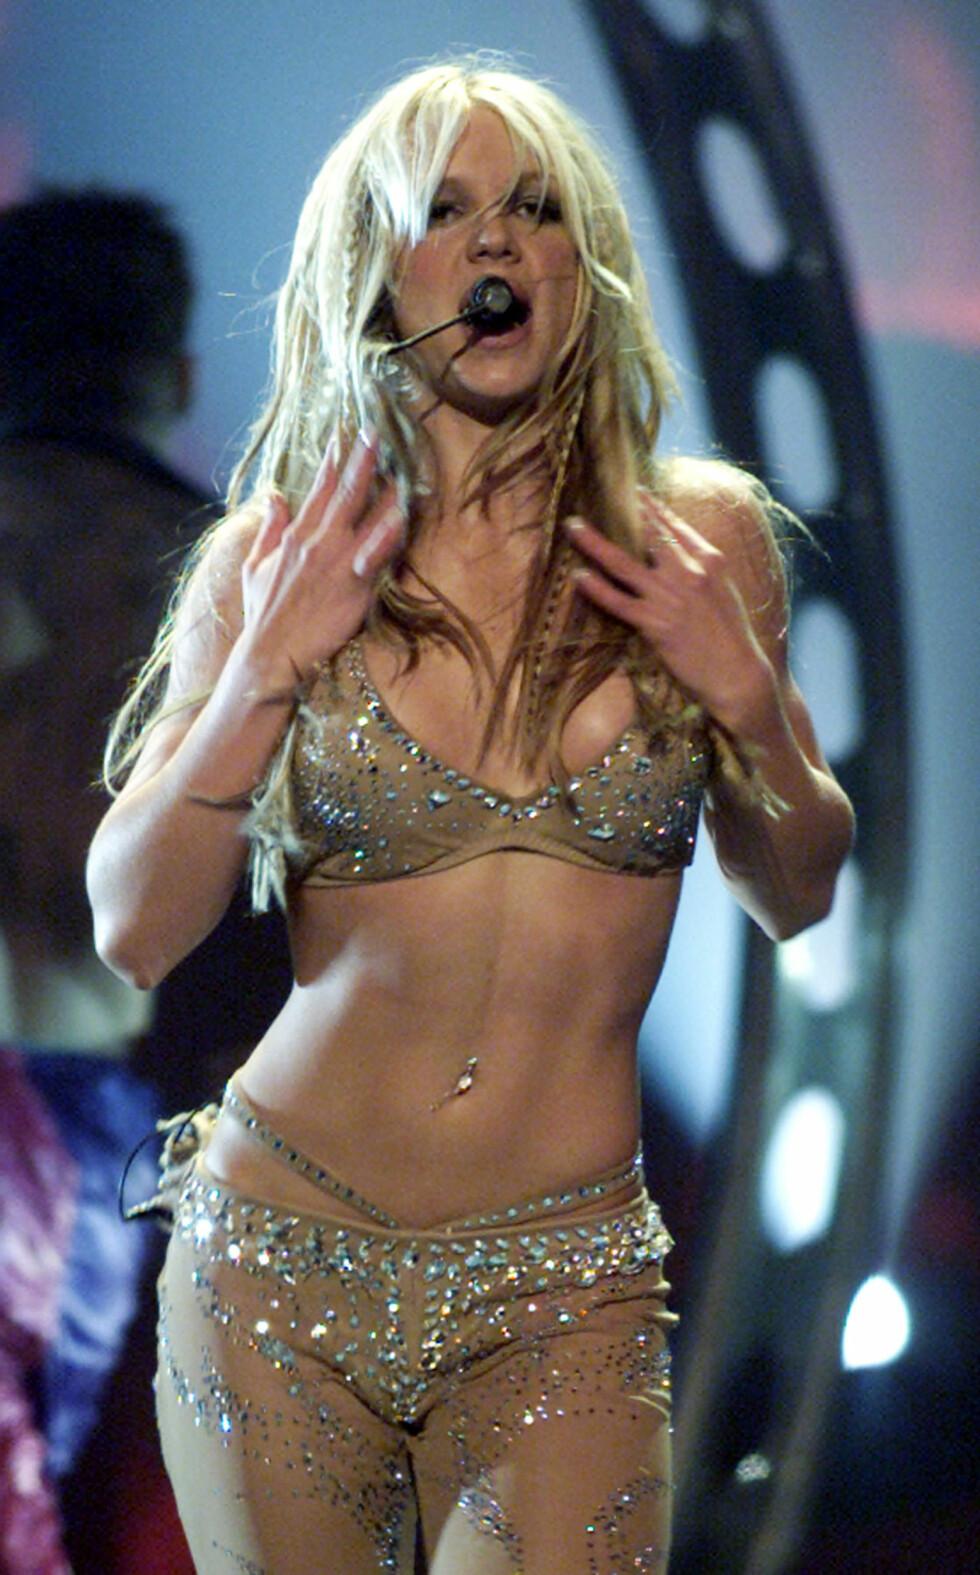 I KNALLFORM: Da Britney Spears var superstjerne rundt år 2000, viste hun stadig frem den veltrente magen sin i korte topper. Her på scenen under MTV Video Music Awards i New York i september 2000.  Foto: REUTERS